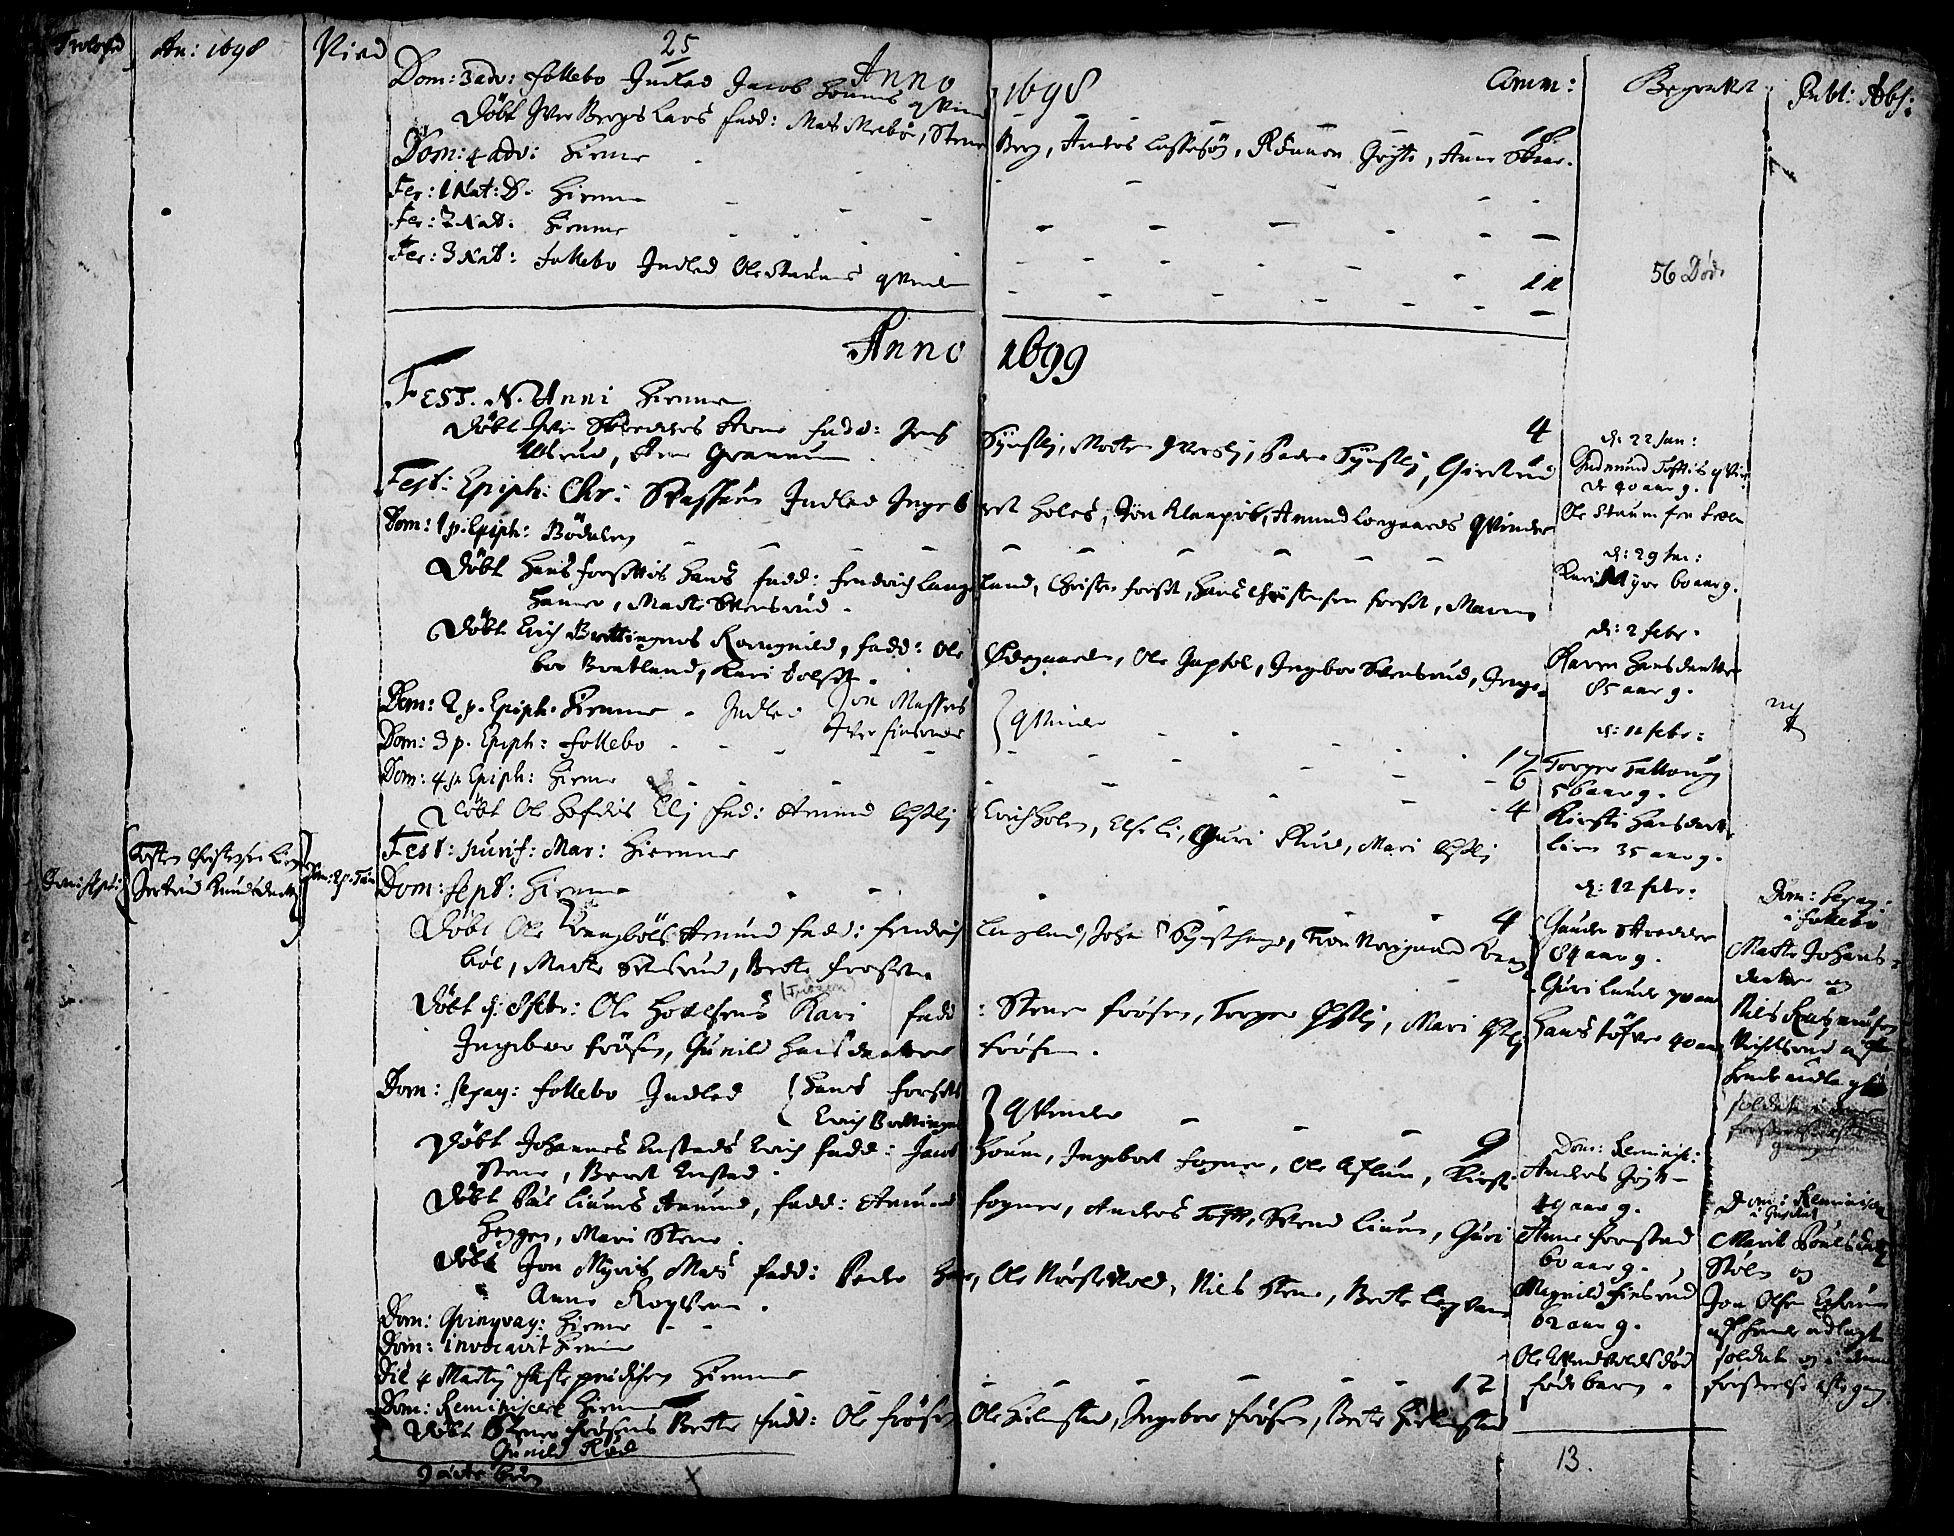 SAH, Gausdal prestekontor, Ministerialbok nr. 1, 1693-1728, s. 25